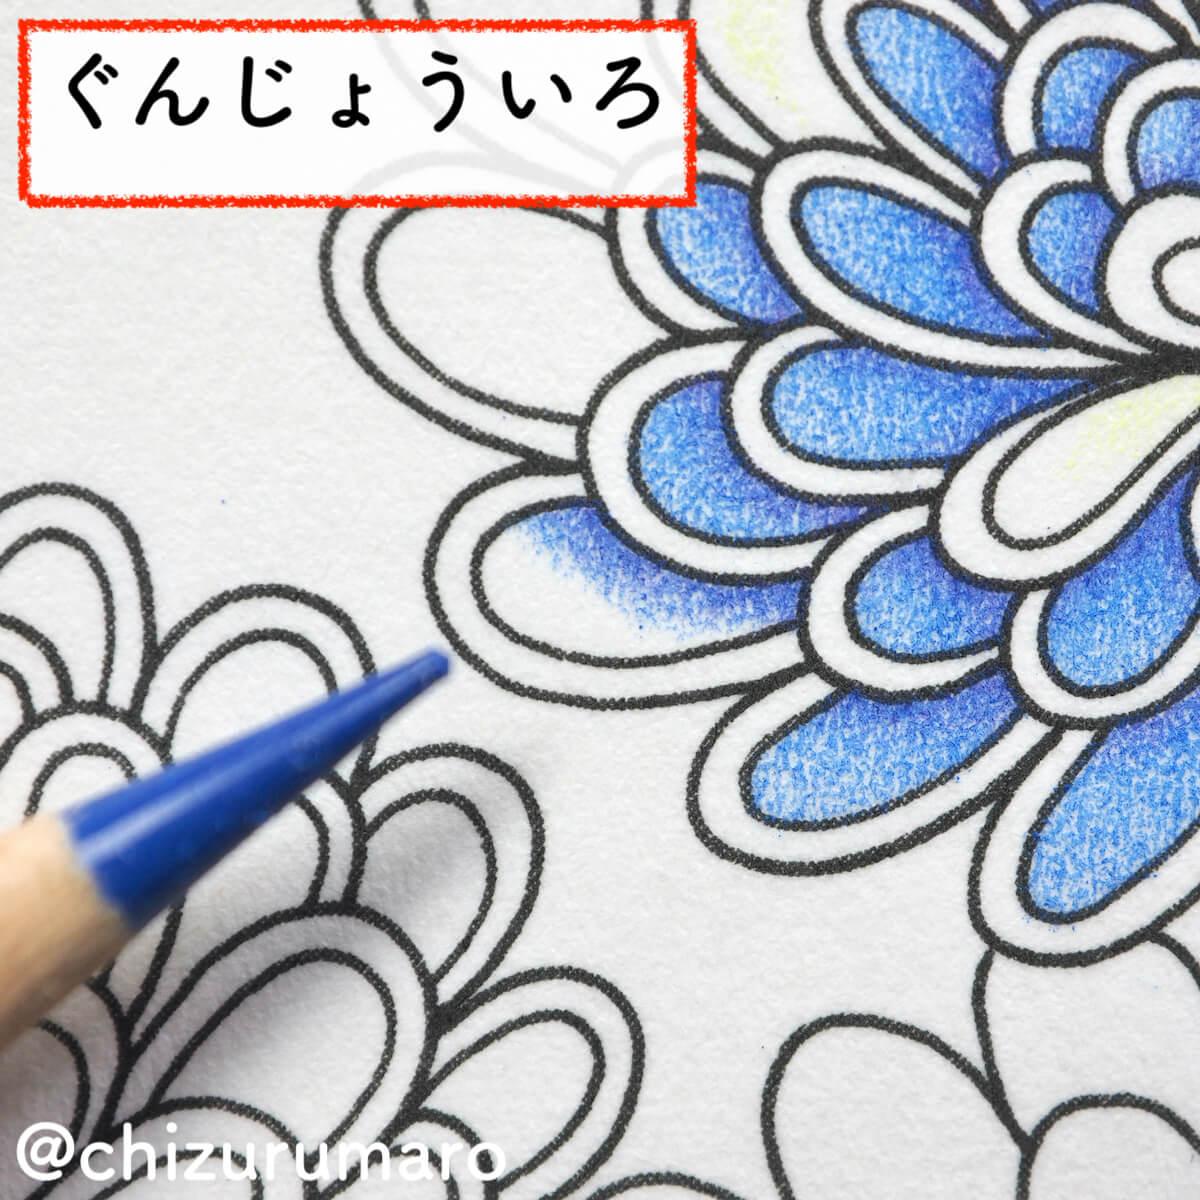 f:id:chizurumaro:20200404105853j:plain